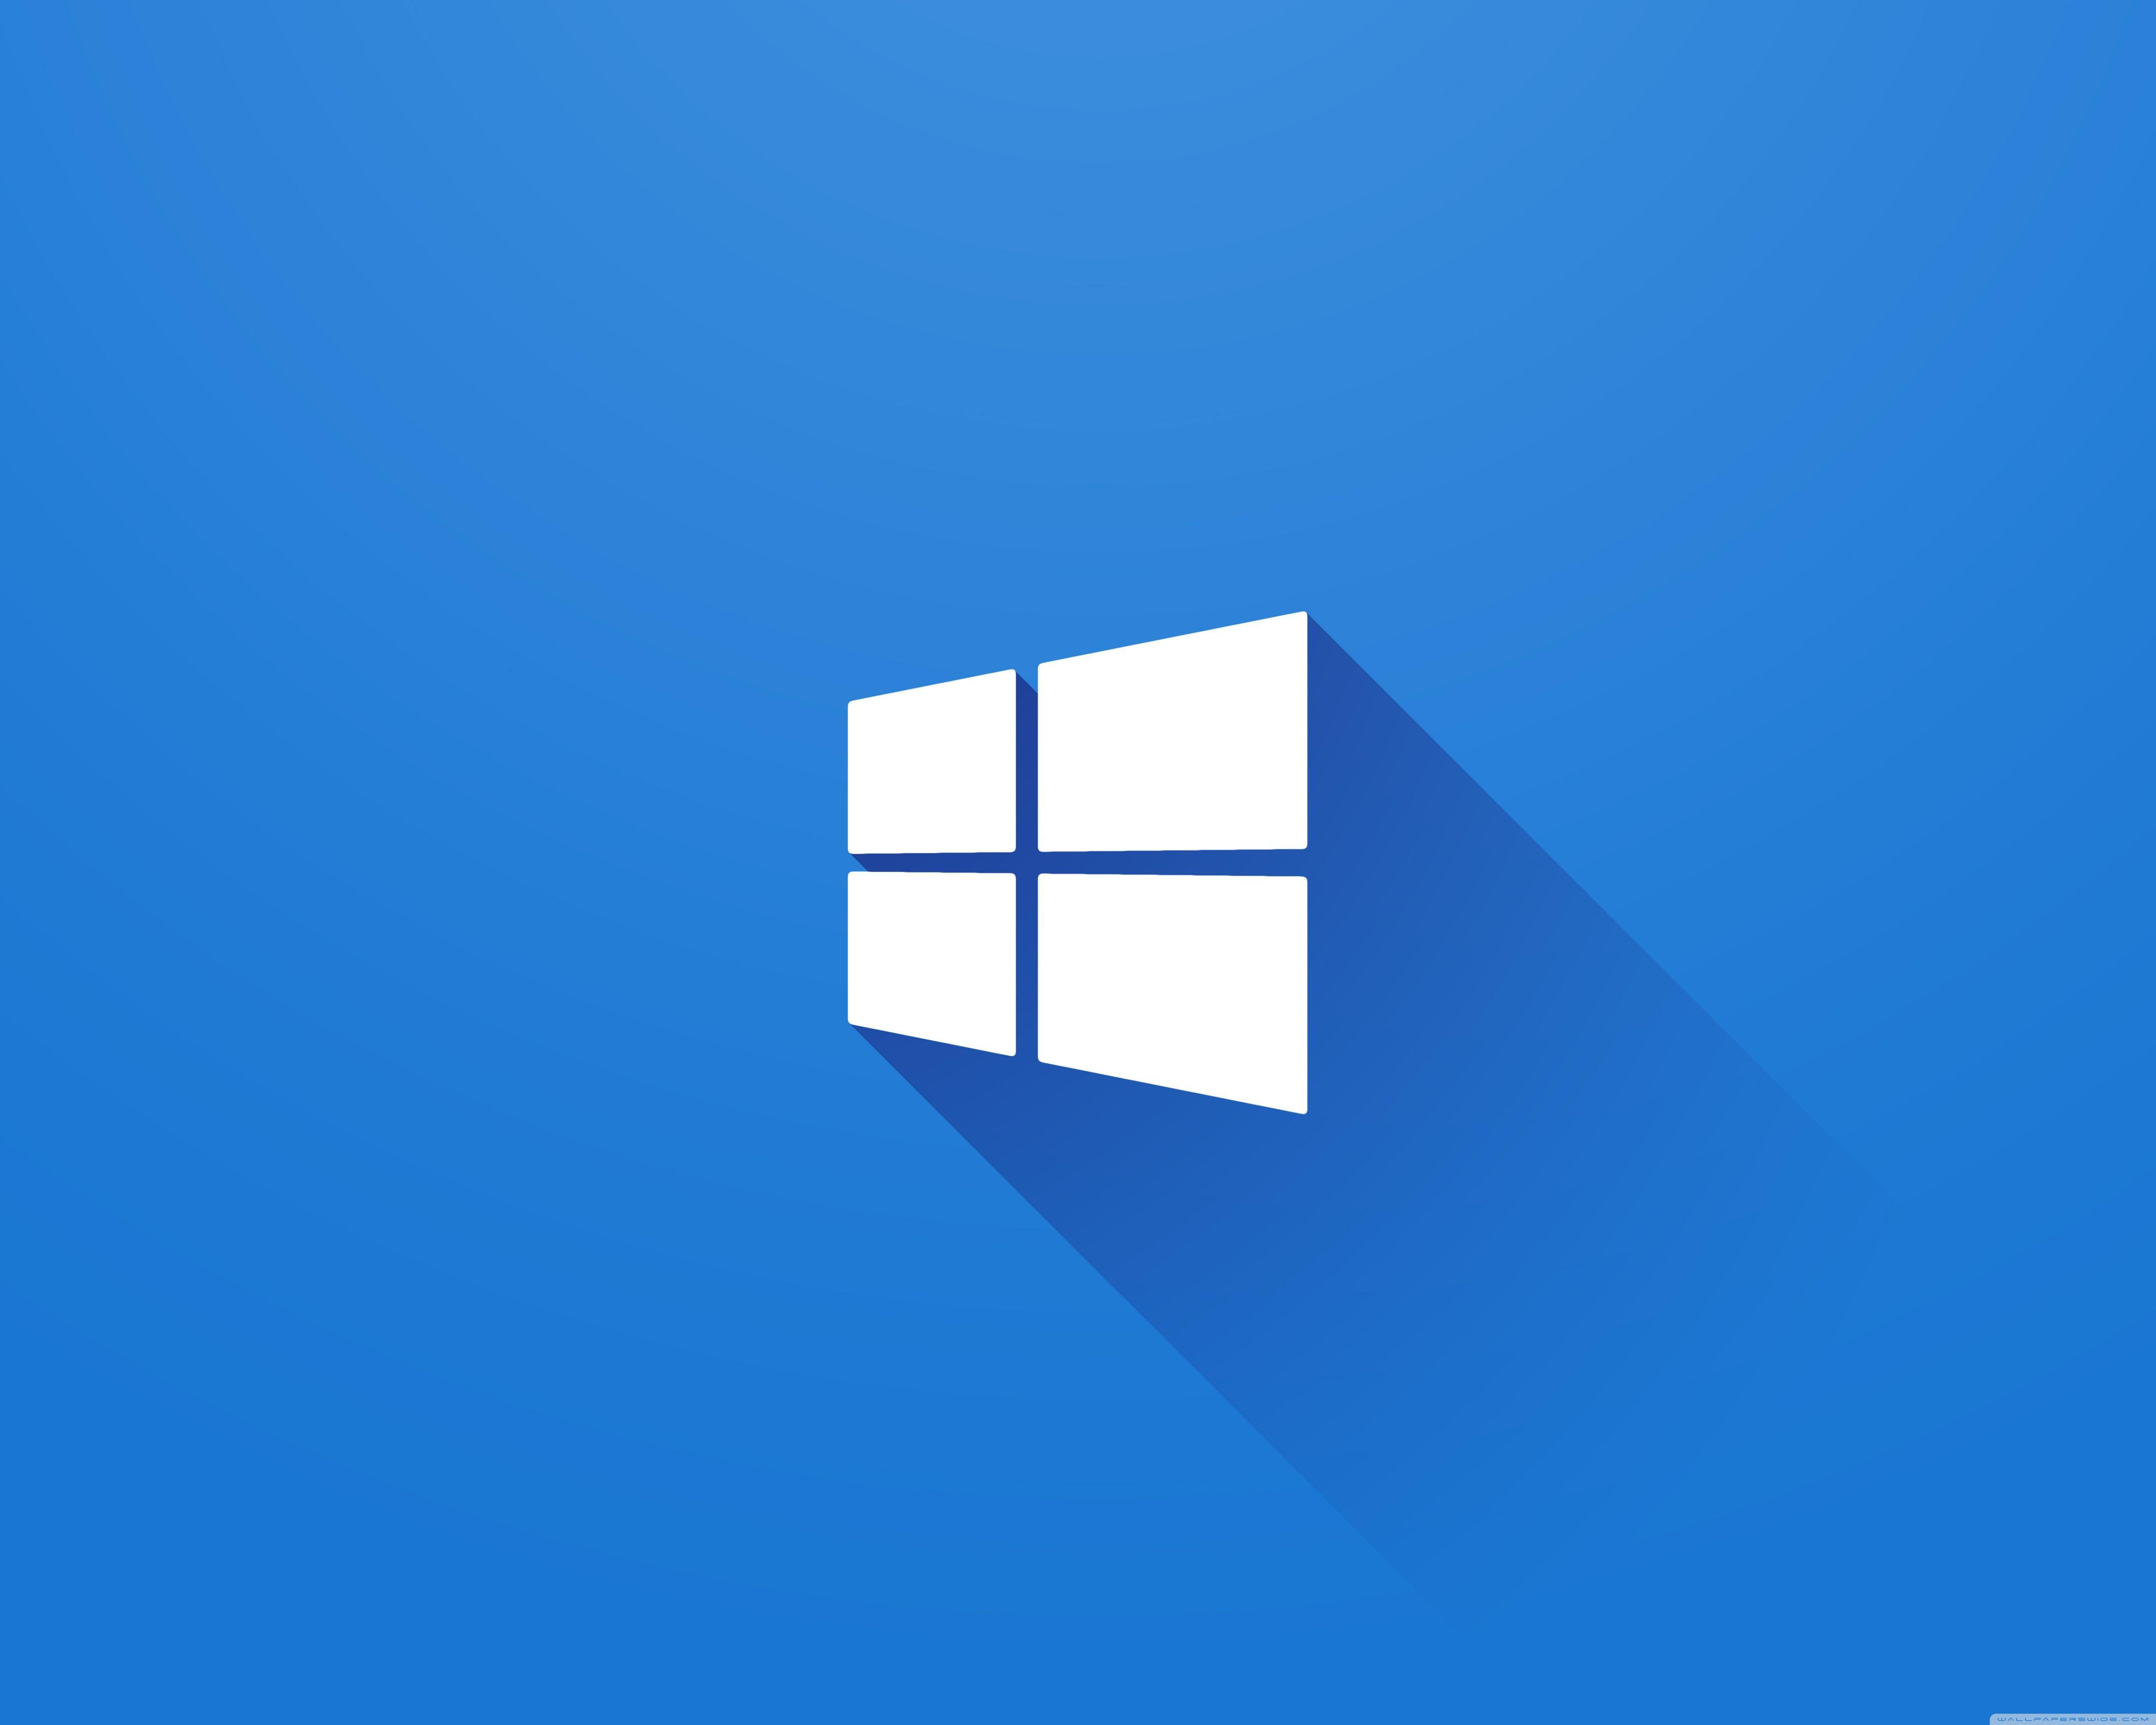 Windows 10 Wallpapers Wallpaper Cave